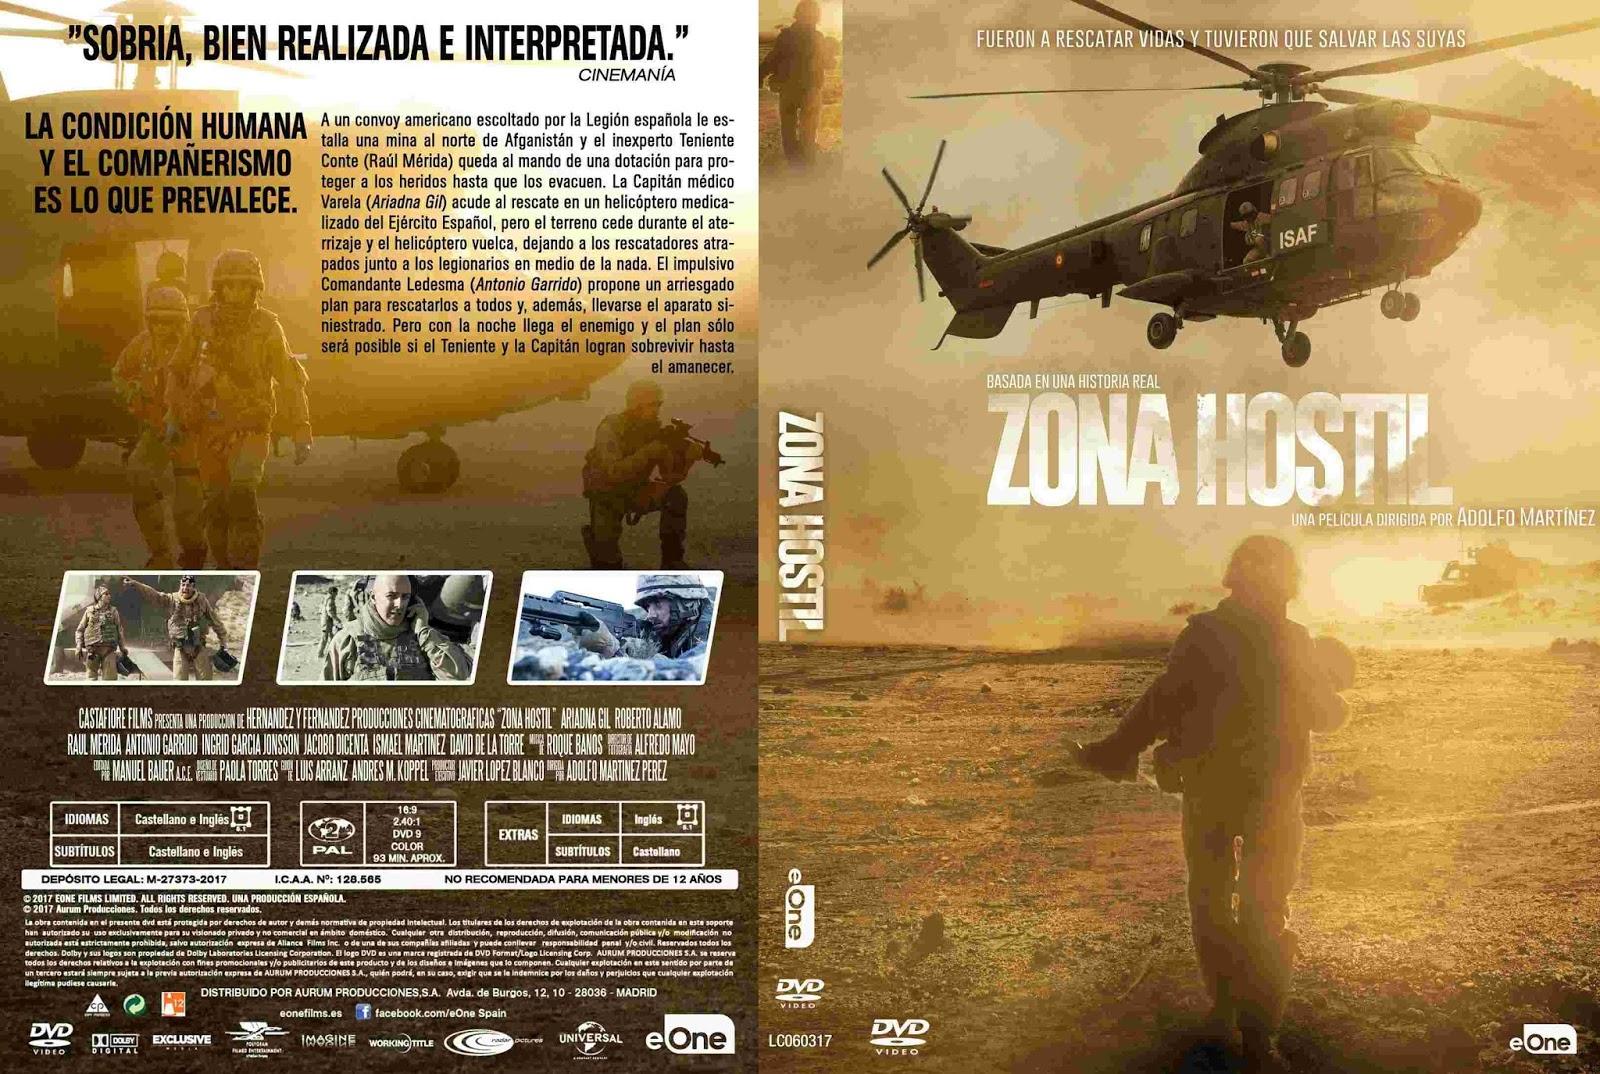 Tudo Capas 04: Rescue Under Fire (2017) SPANISH R2 - Cover ...